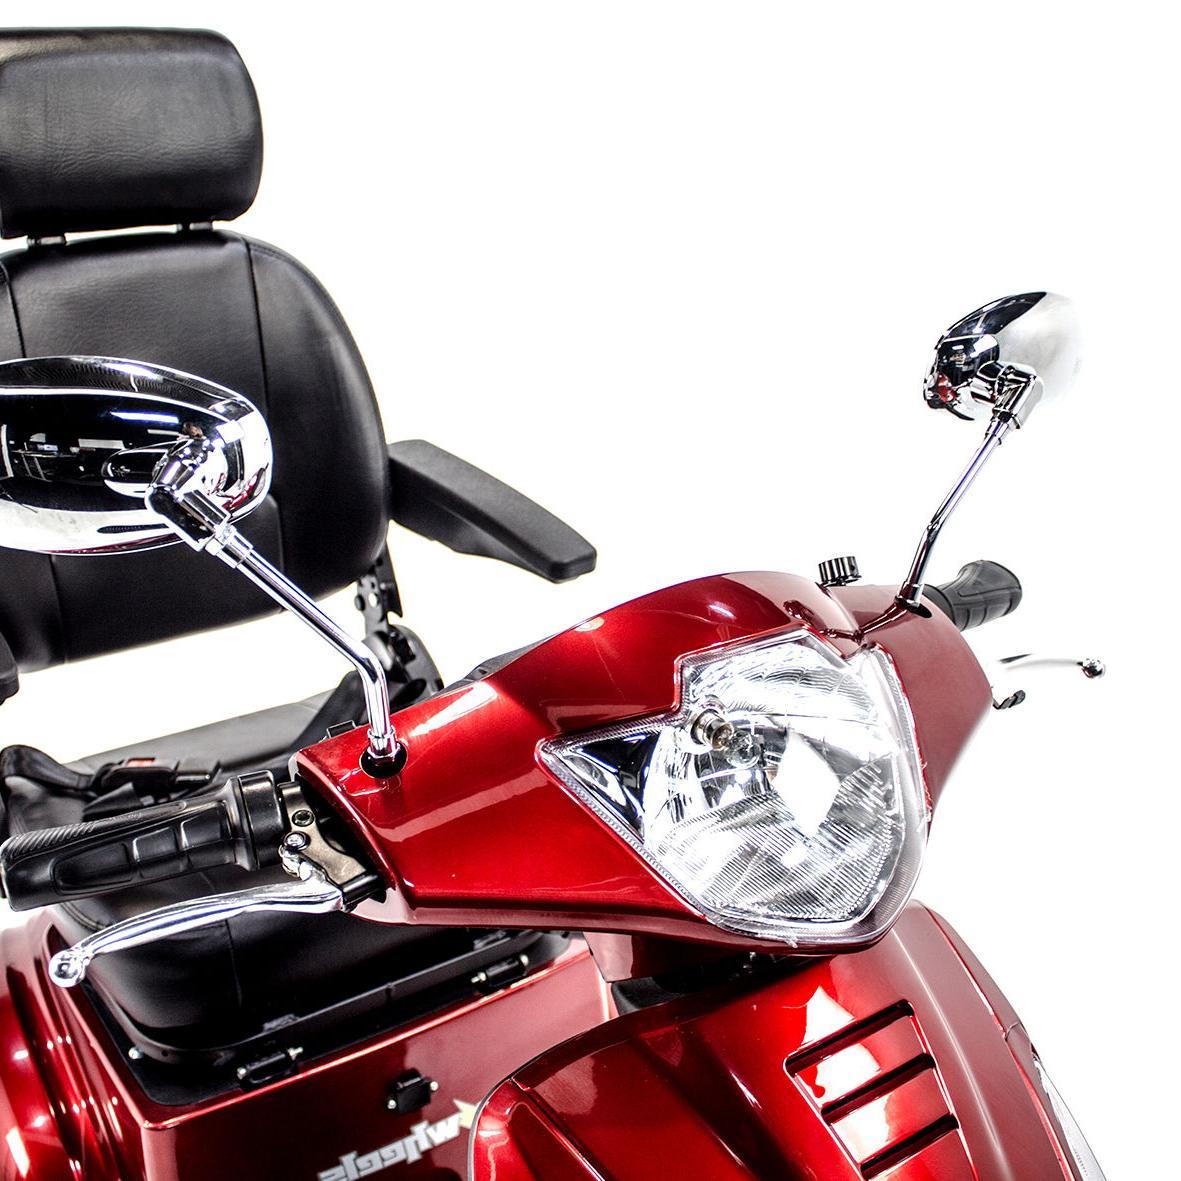 E-Wheels Mobility EW36 + Free Accessory Bundle!